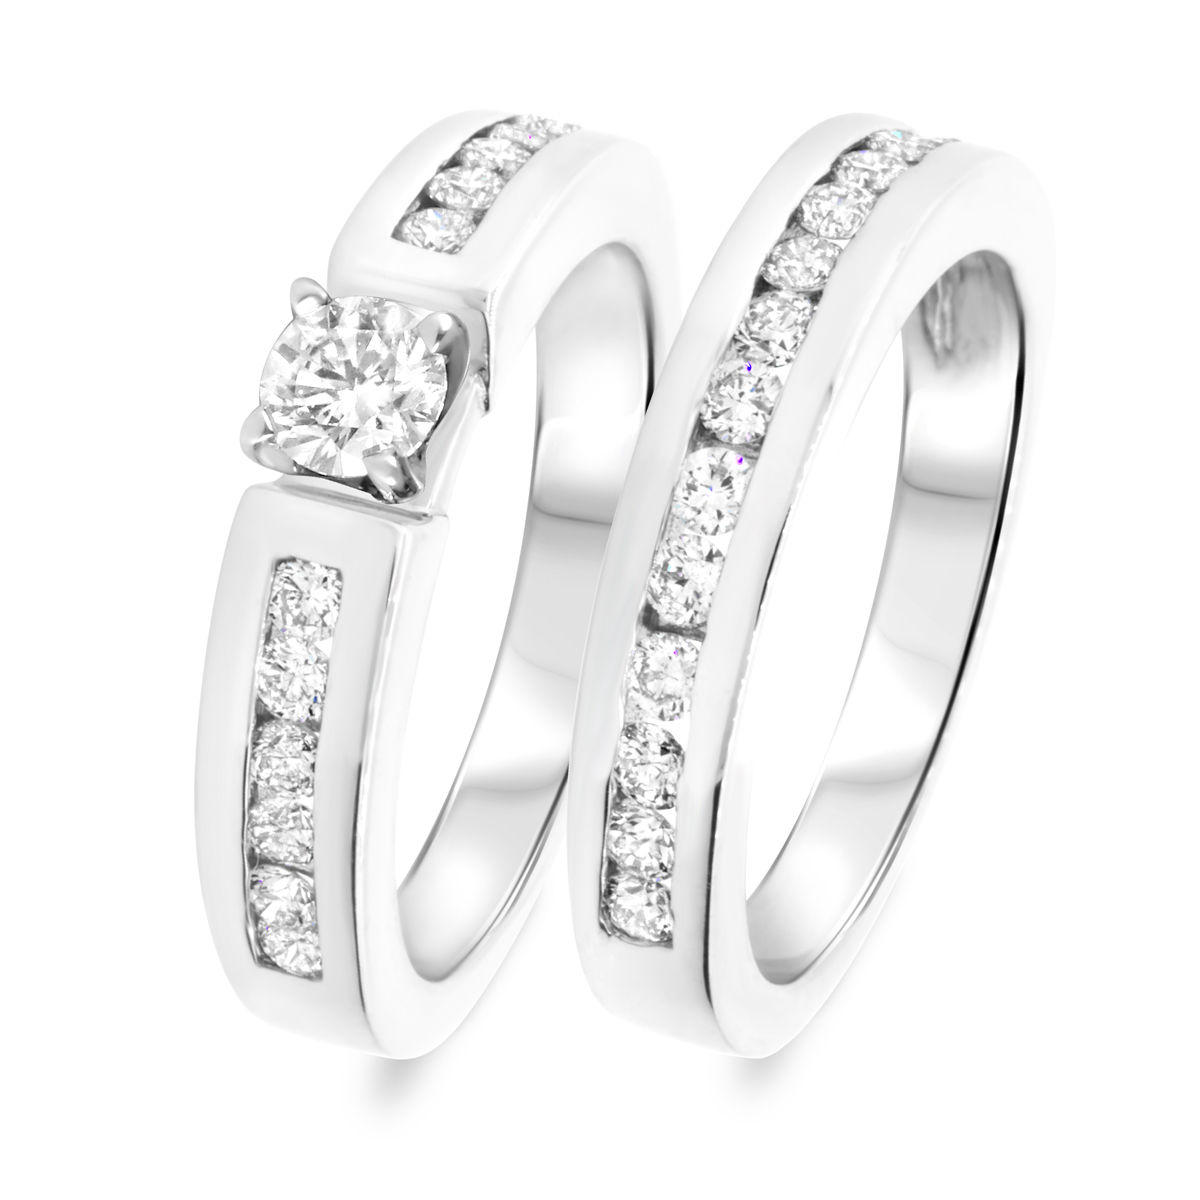 1 1/4 CT. T.W. Diamond Women's Bridal Wedding Ring Set 14K White Gold